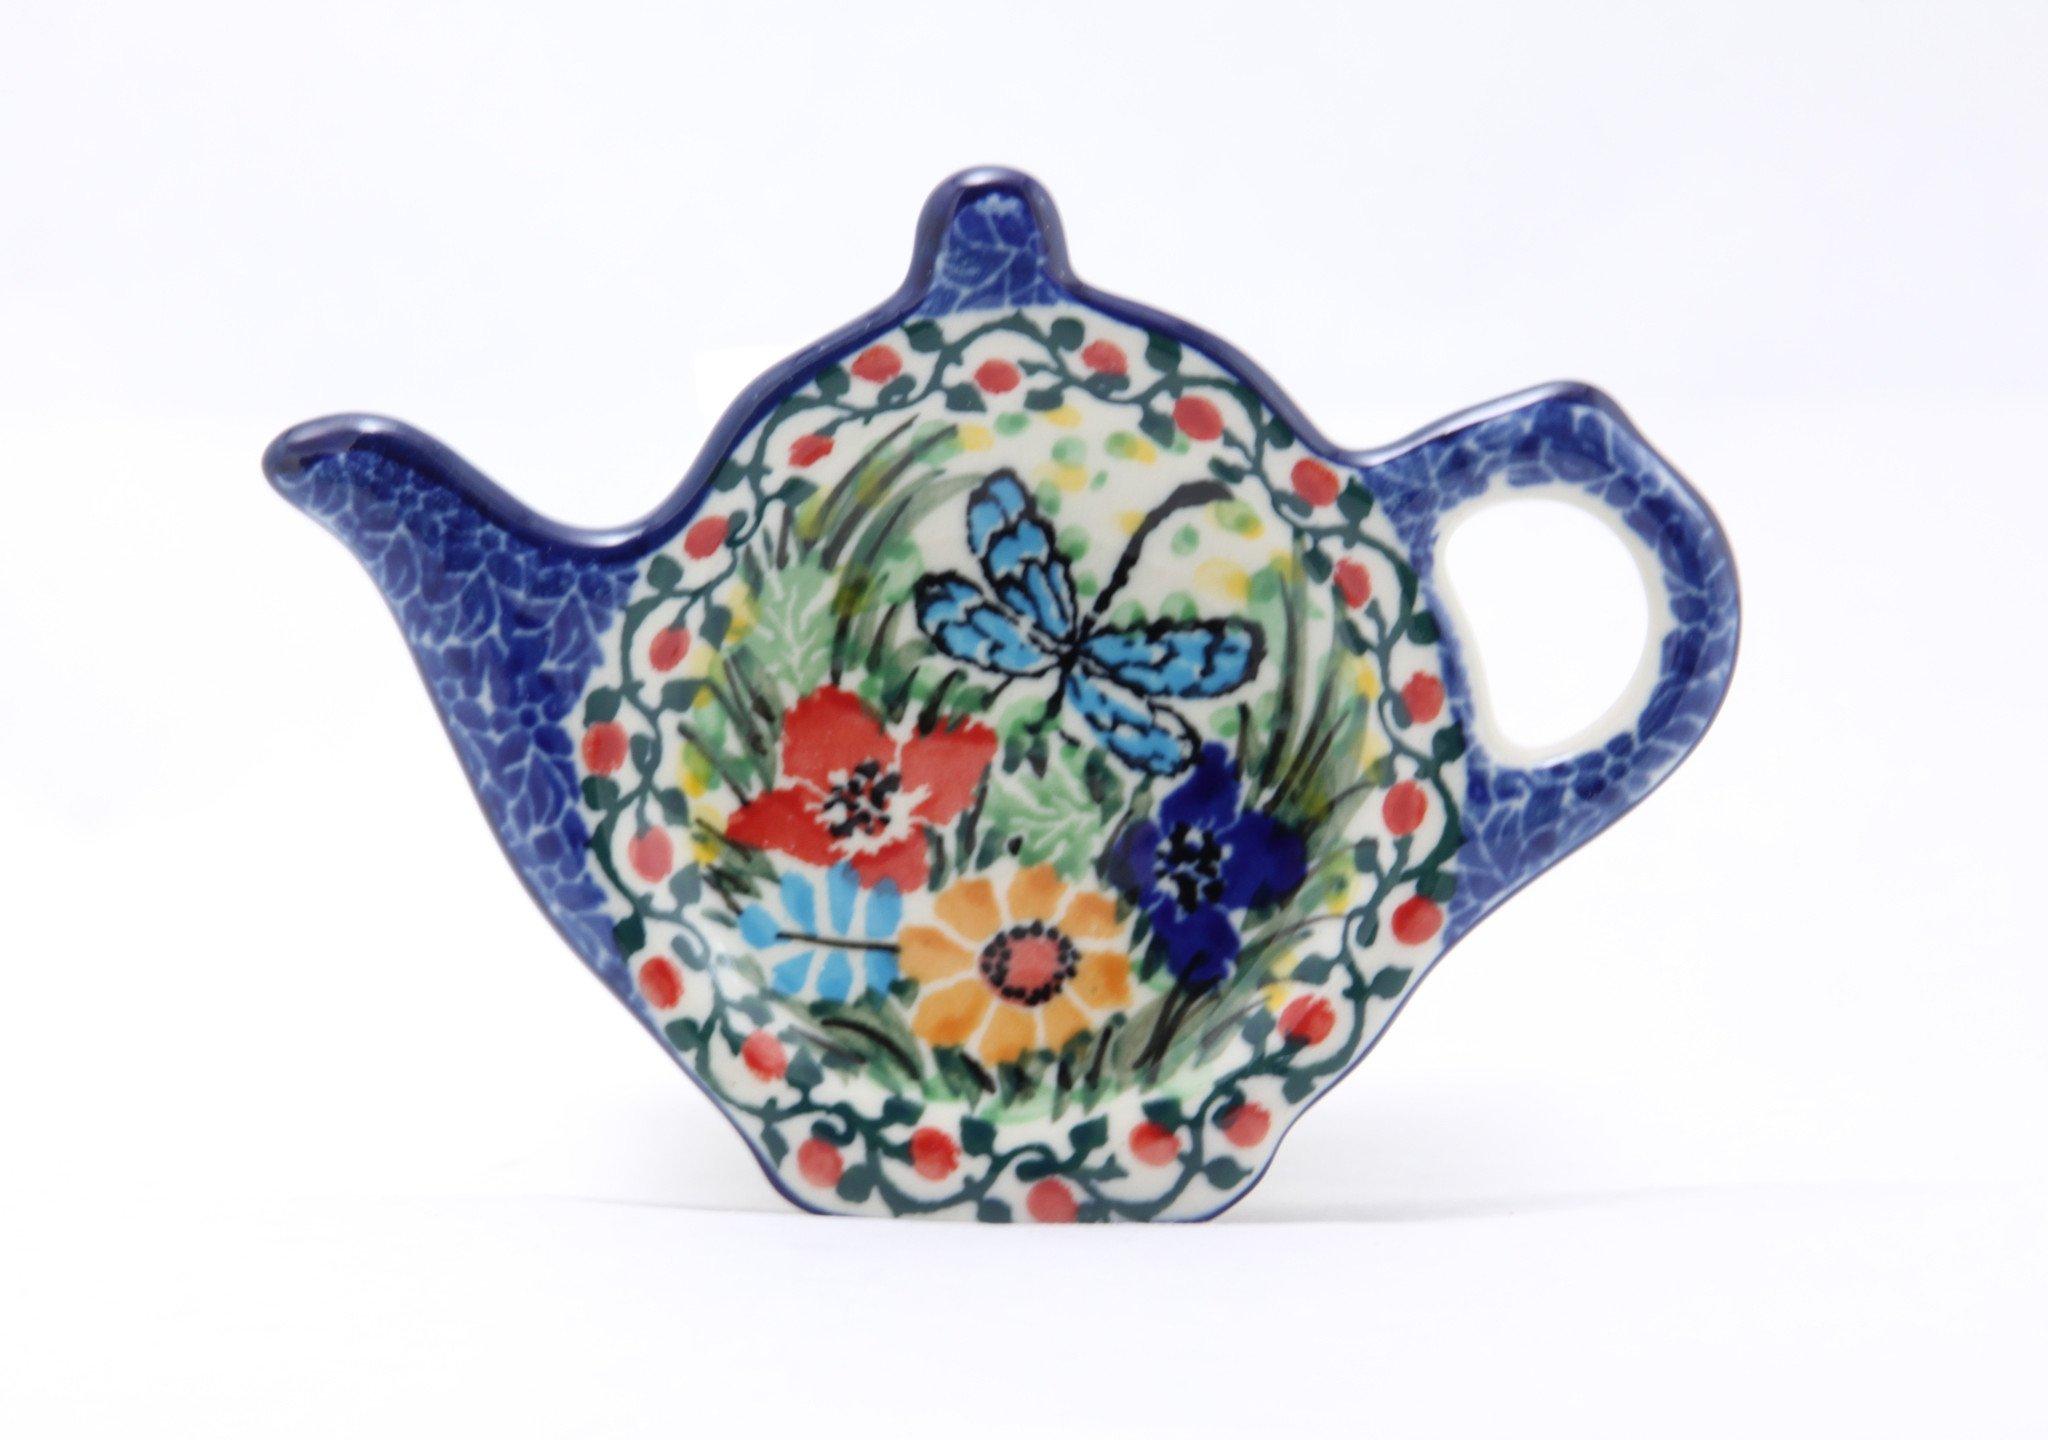 Ceramika Artystyczna Polish Pottery Handmade Ceramic Tea Bag Plate Made in Poland by Ceramika Artystyczna